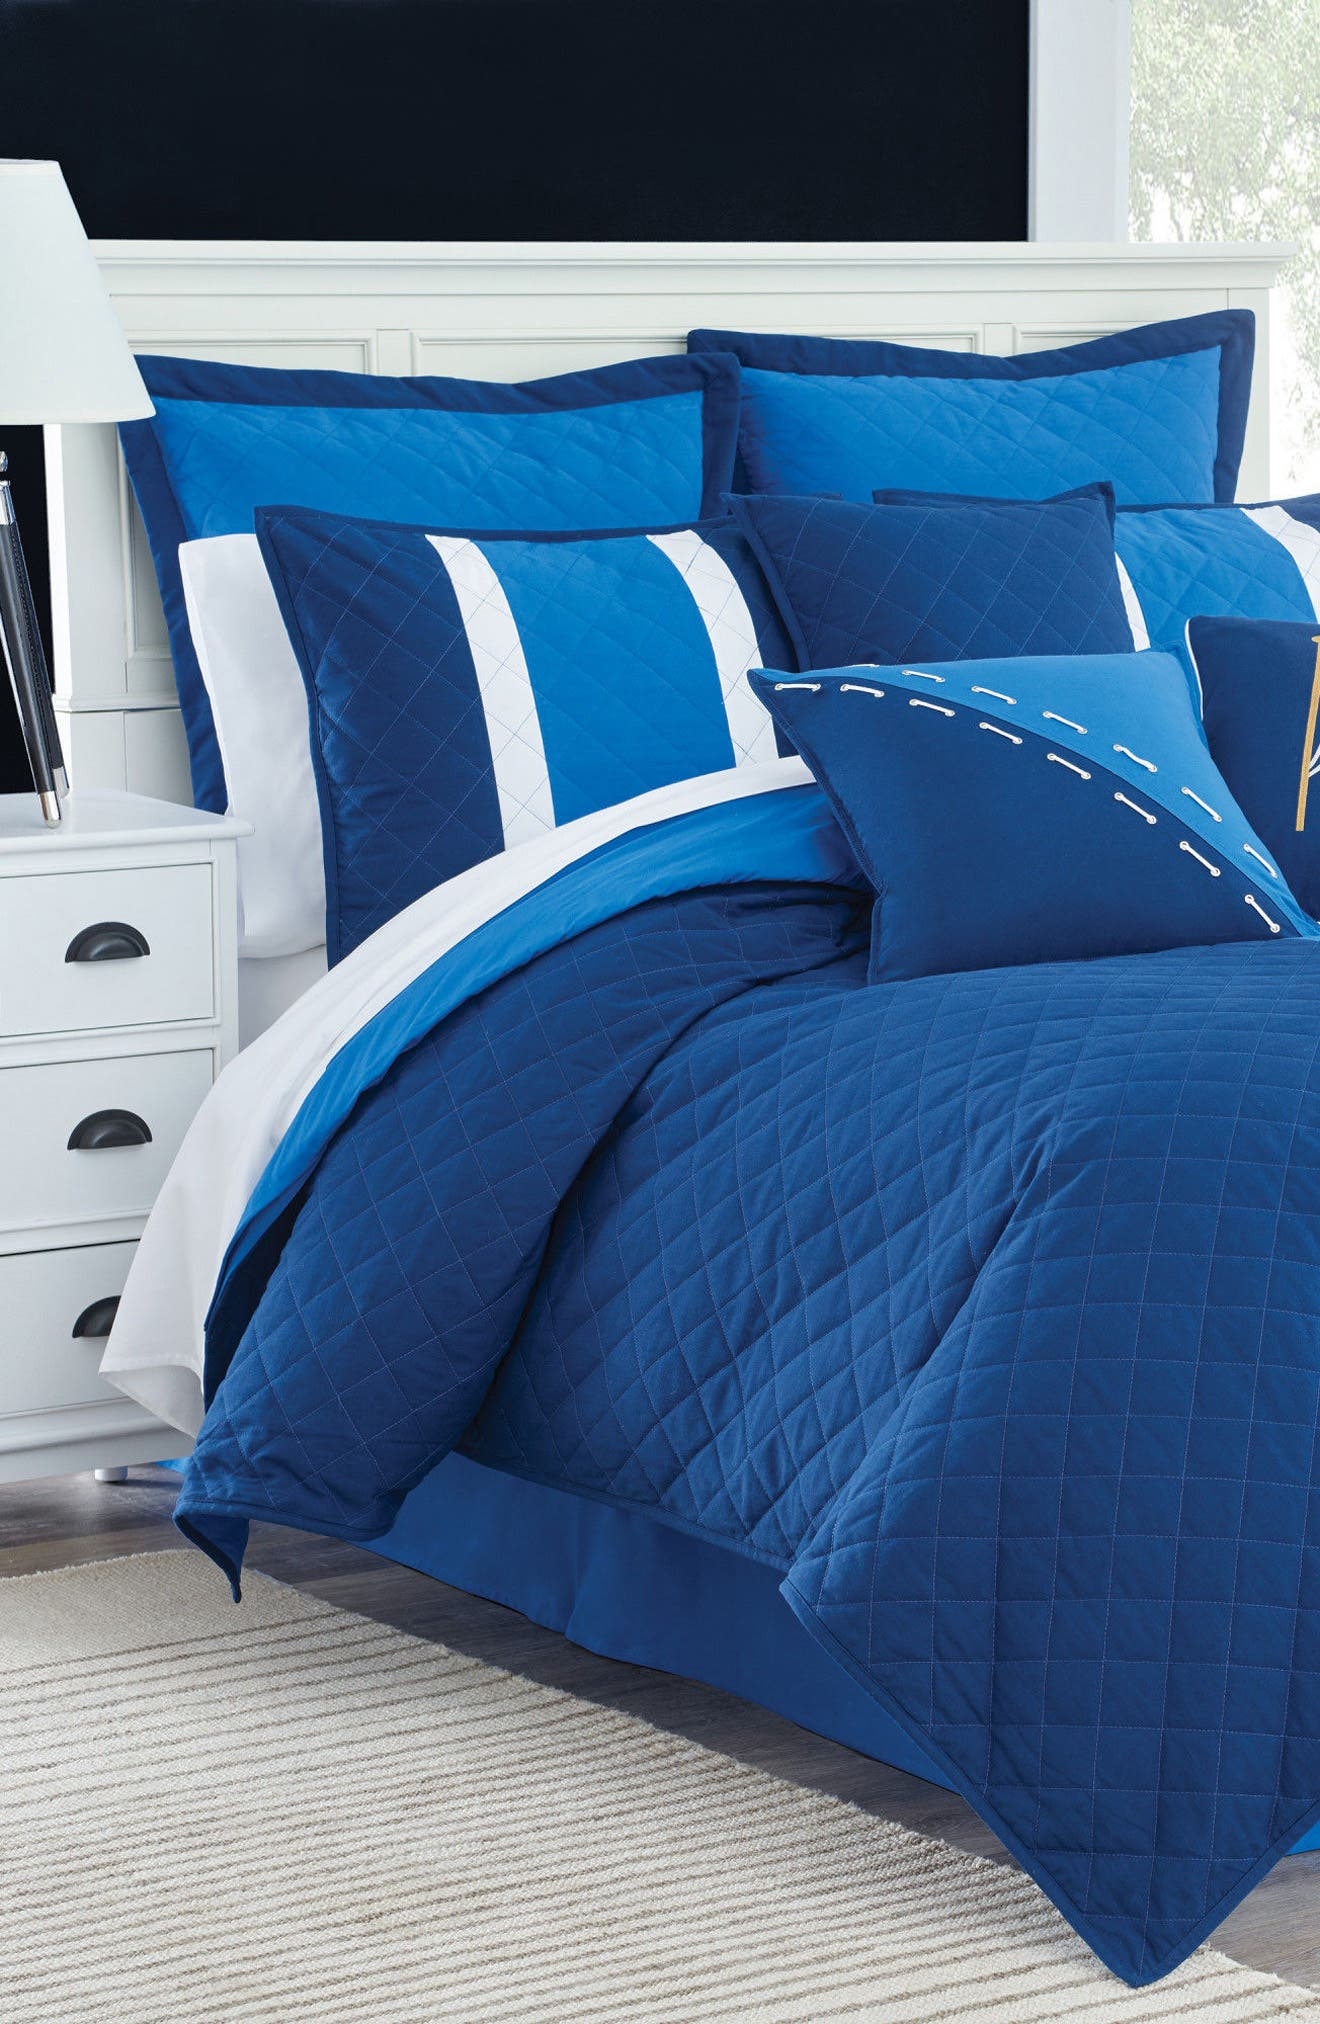 Southern Tide Yacht Club Comforter, Sham & Bed Skirt Set